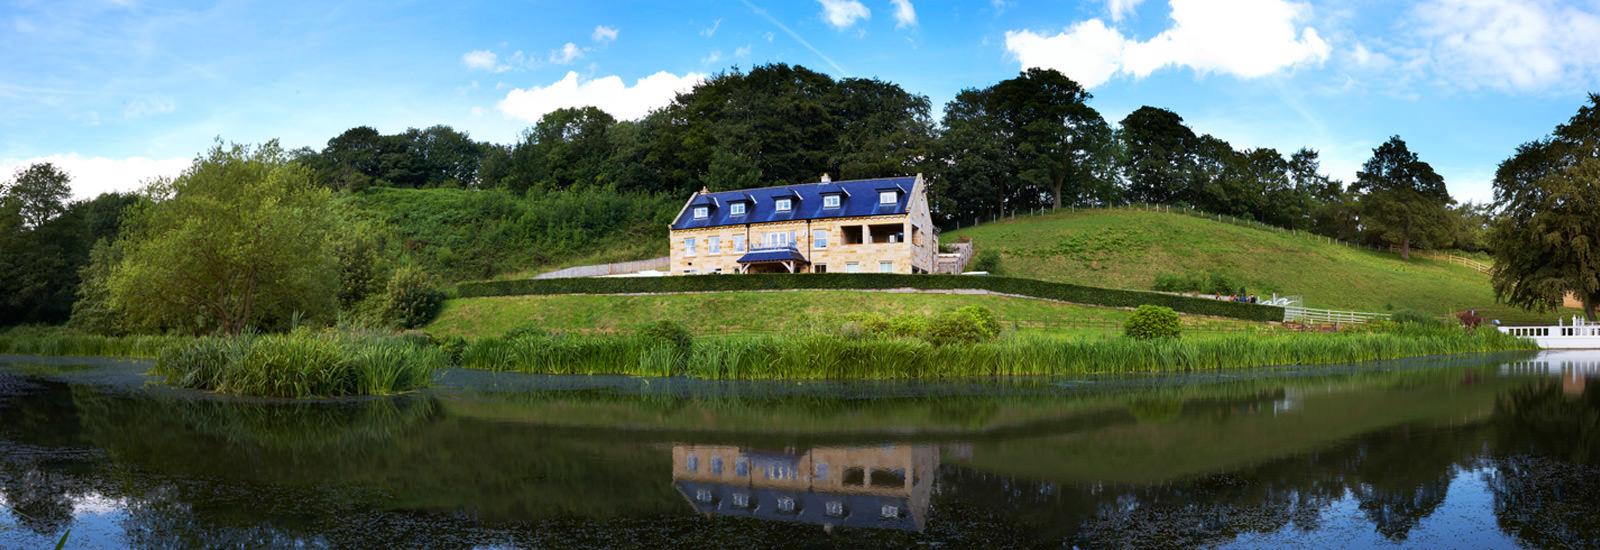 Panoramic view of the Lake House at Raithwaite Estate